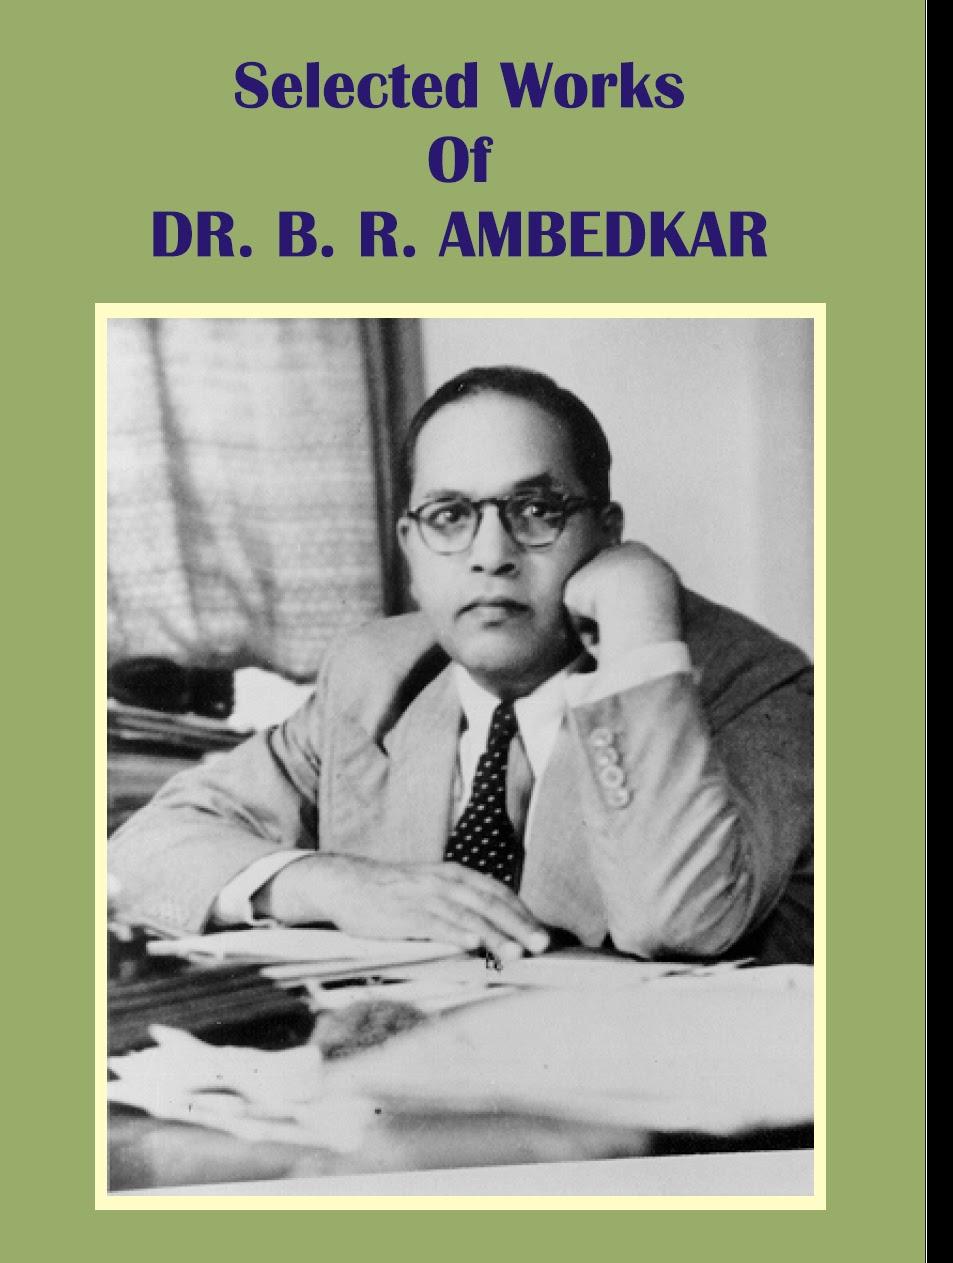 communist study circle of dr b r ambedkar books  of dr b r ambedkar books